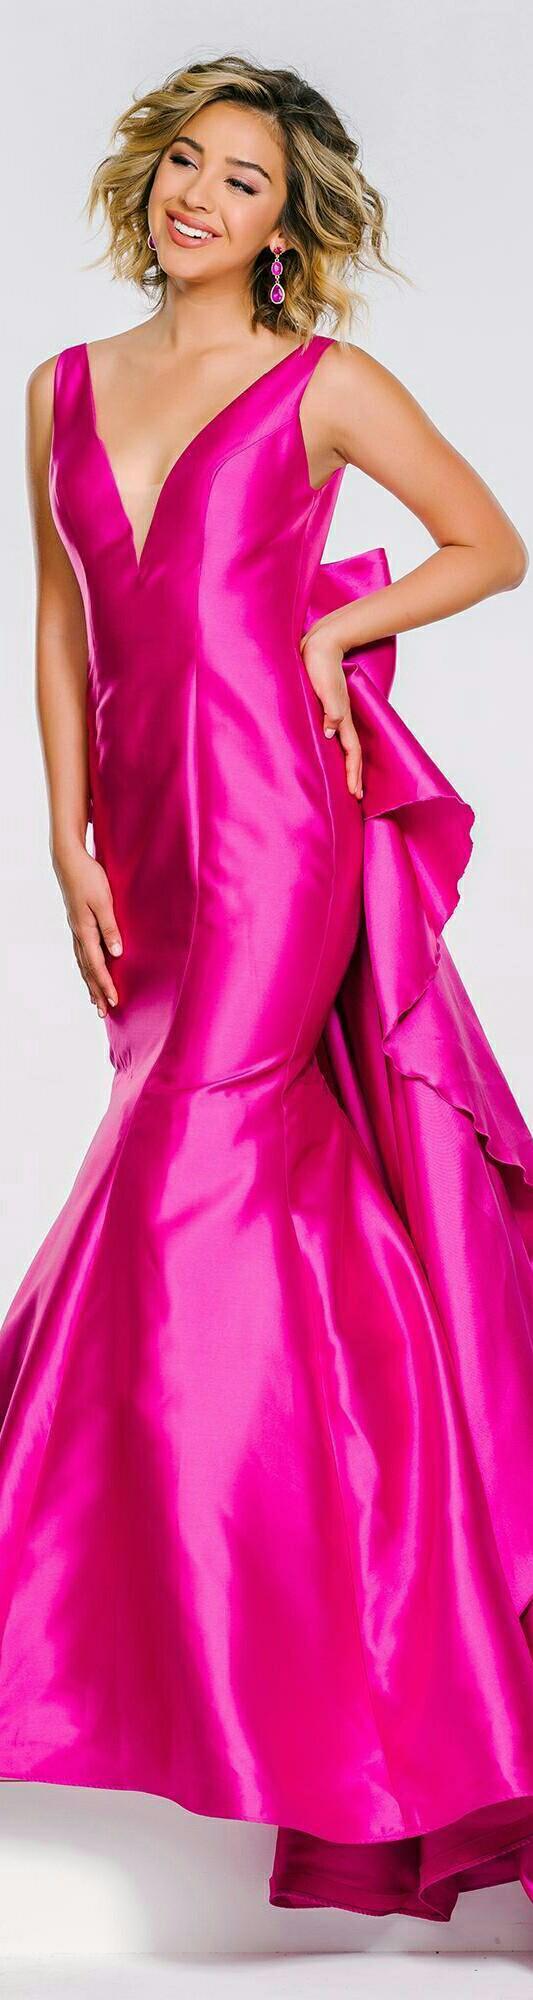 JOVANI • Fuchsia Mermaid-Style Bow Back Prom Dress • #41644 ...